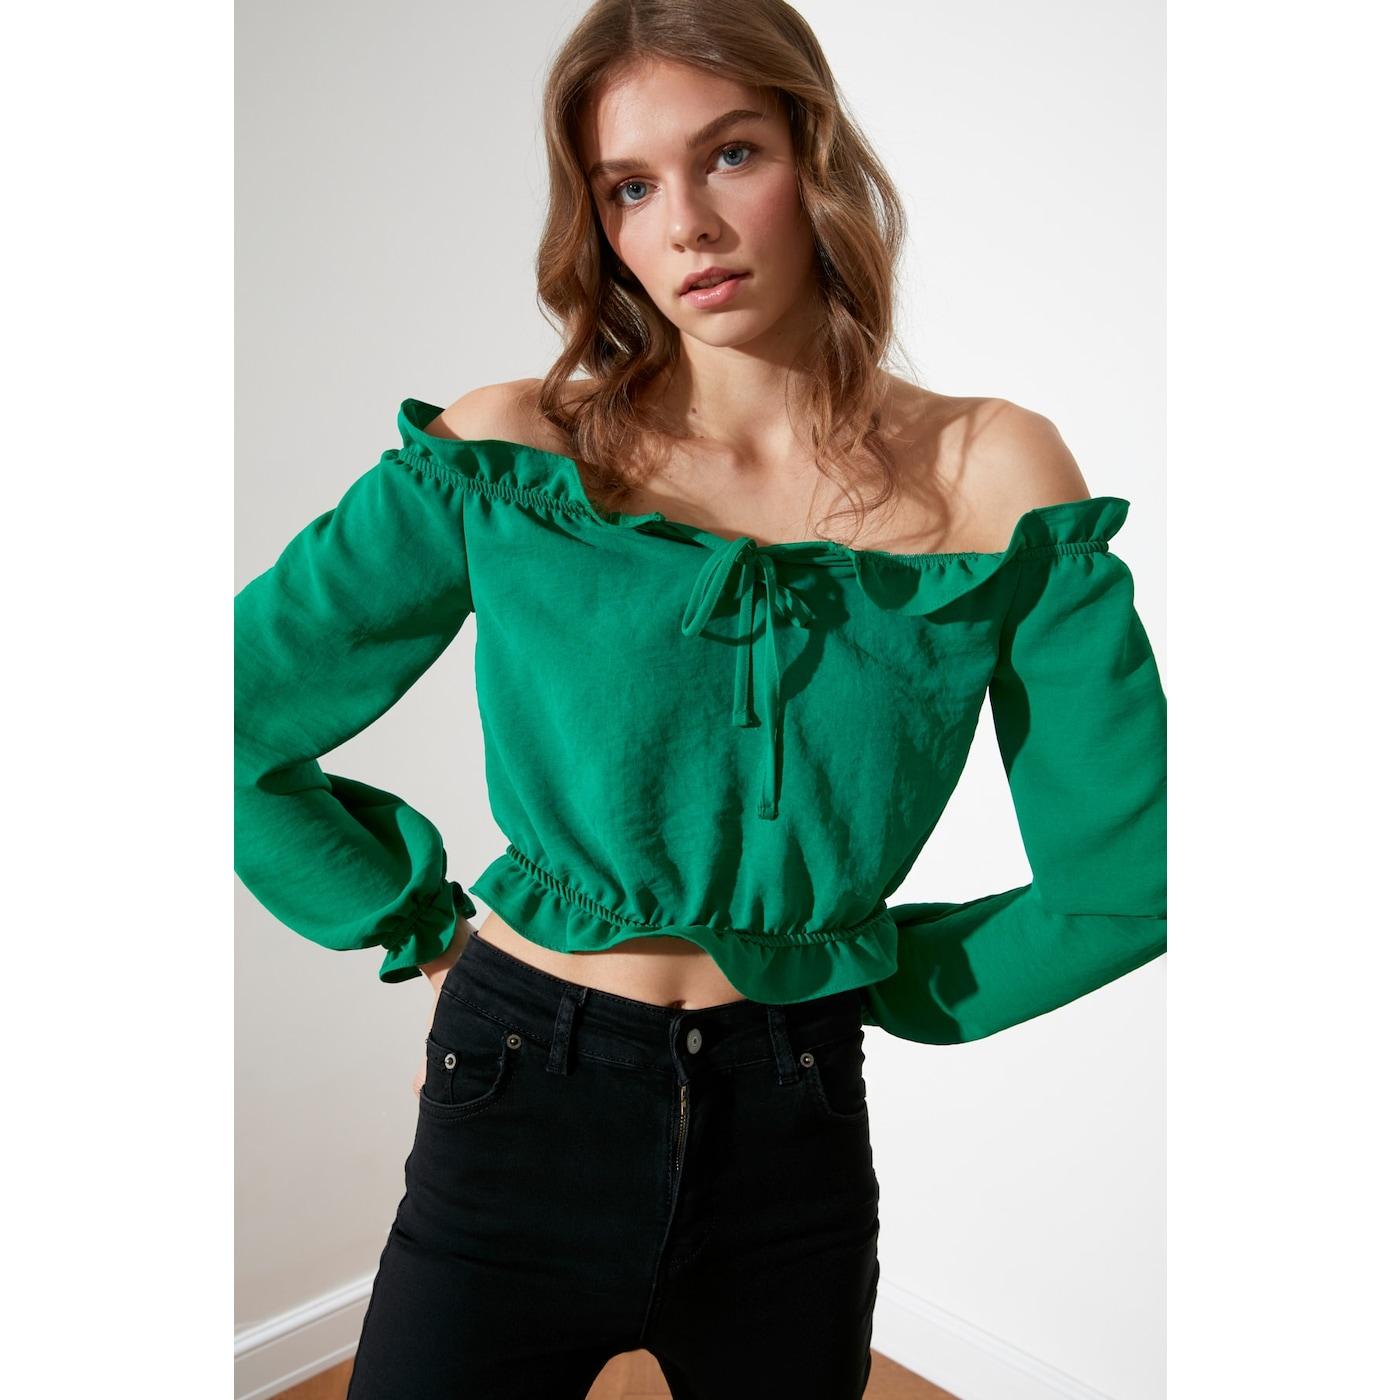 Trendyol Green Binding Detailed Blouse dámské 34